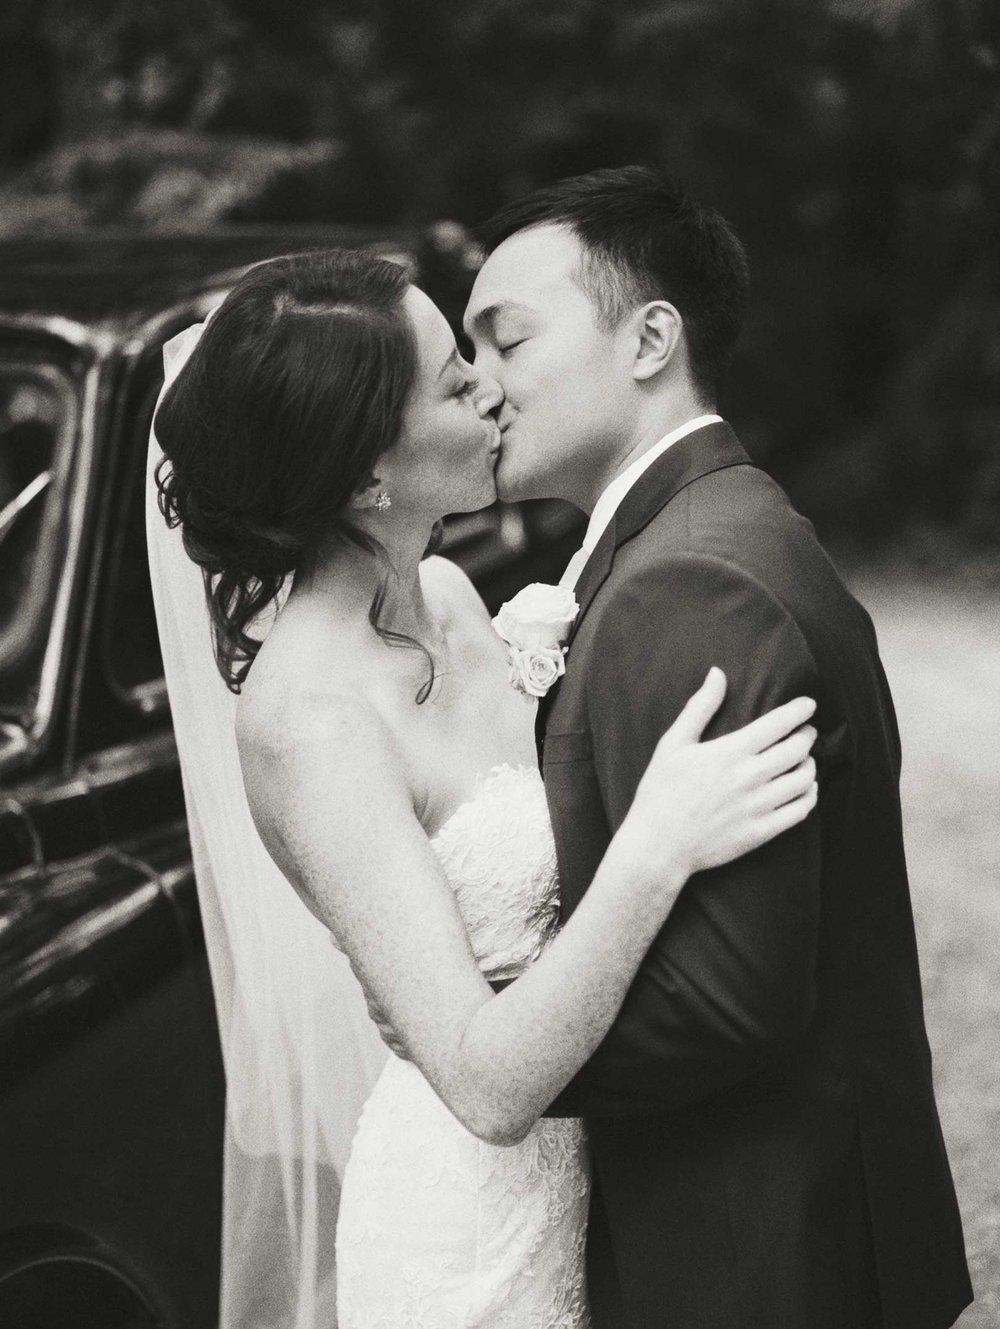 Nestldown California wedding photos